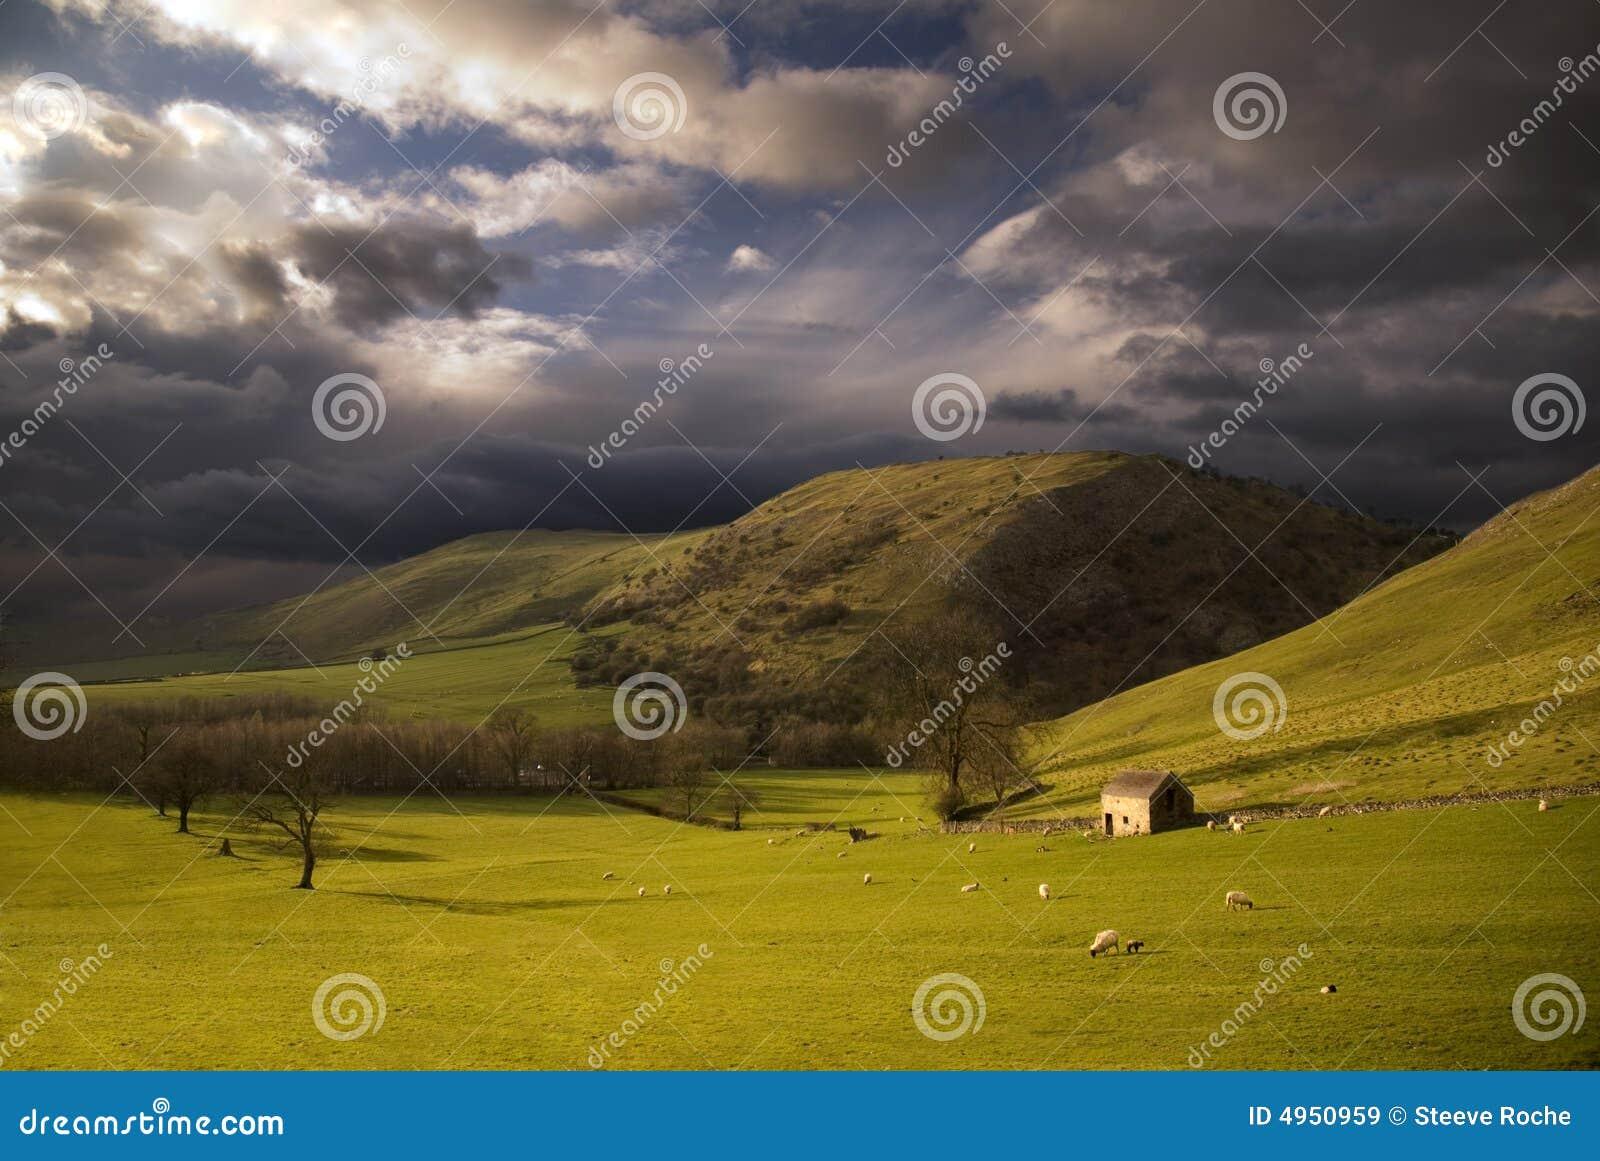 Landscape in Peak District. England